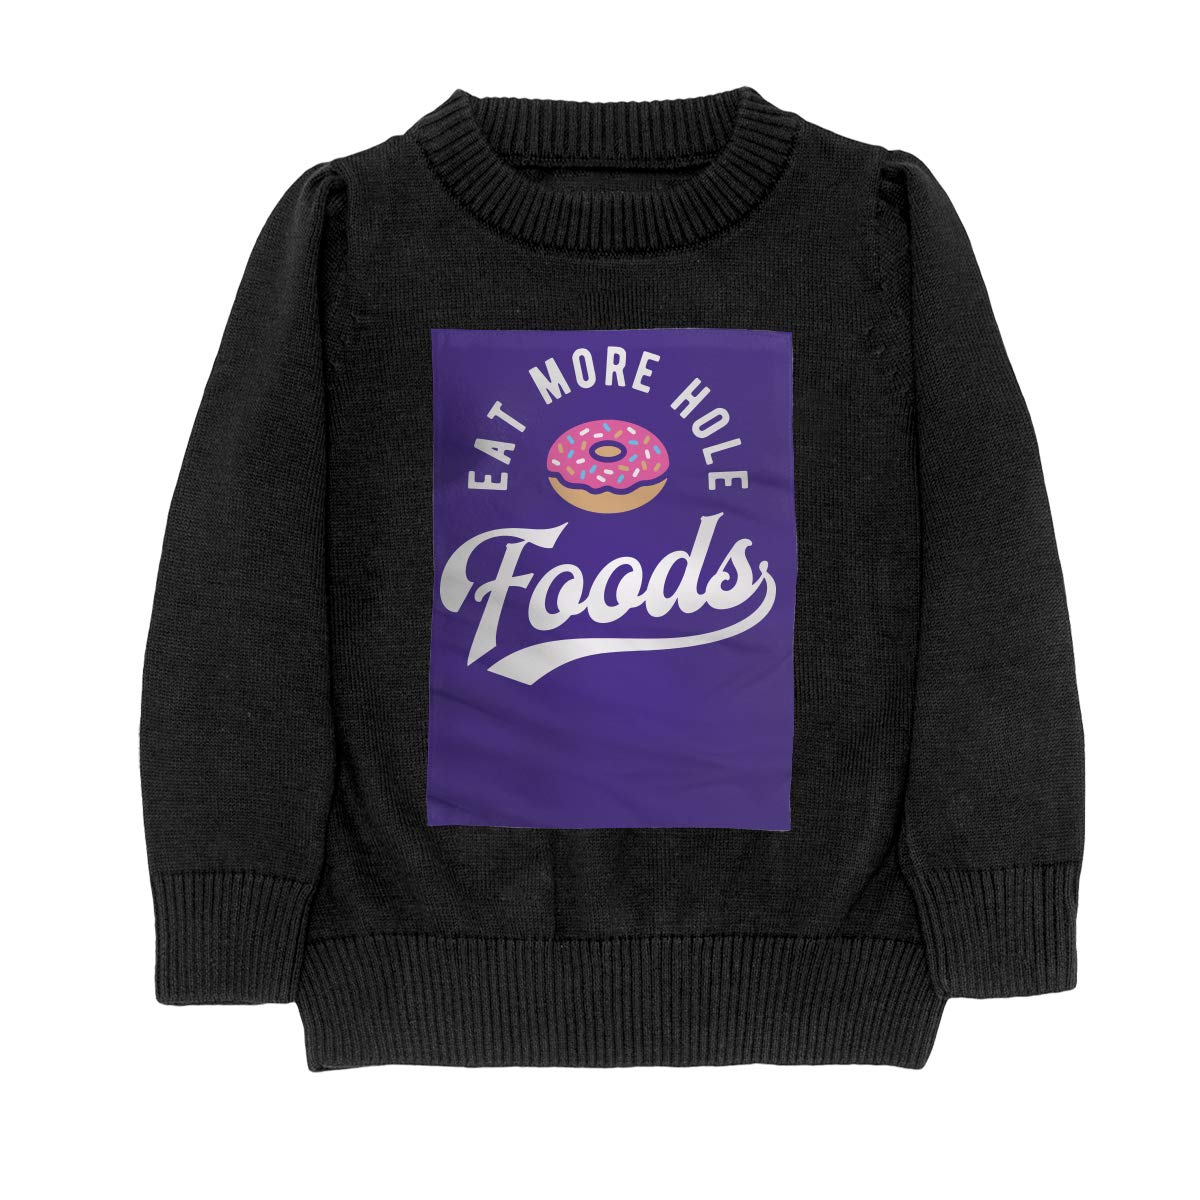 WWTBBJ-B Eat More Hole Foods Doughnut Style Adolescent Boys /& Girls Unisex Sweater Keep Warm